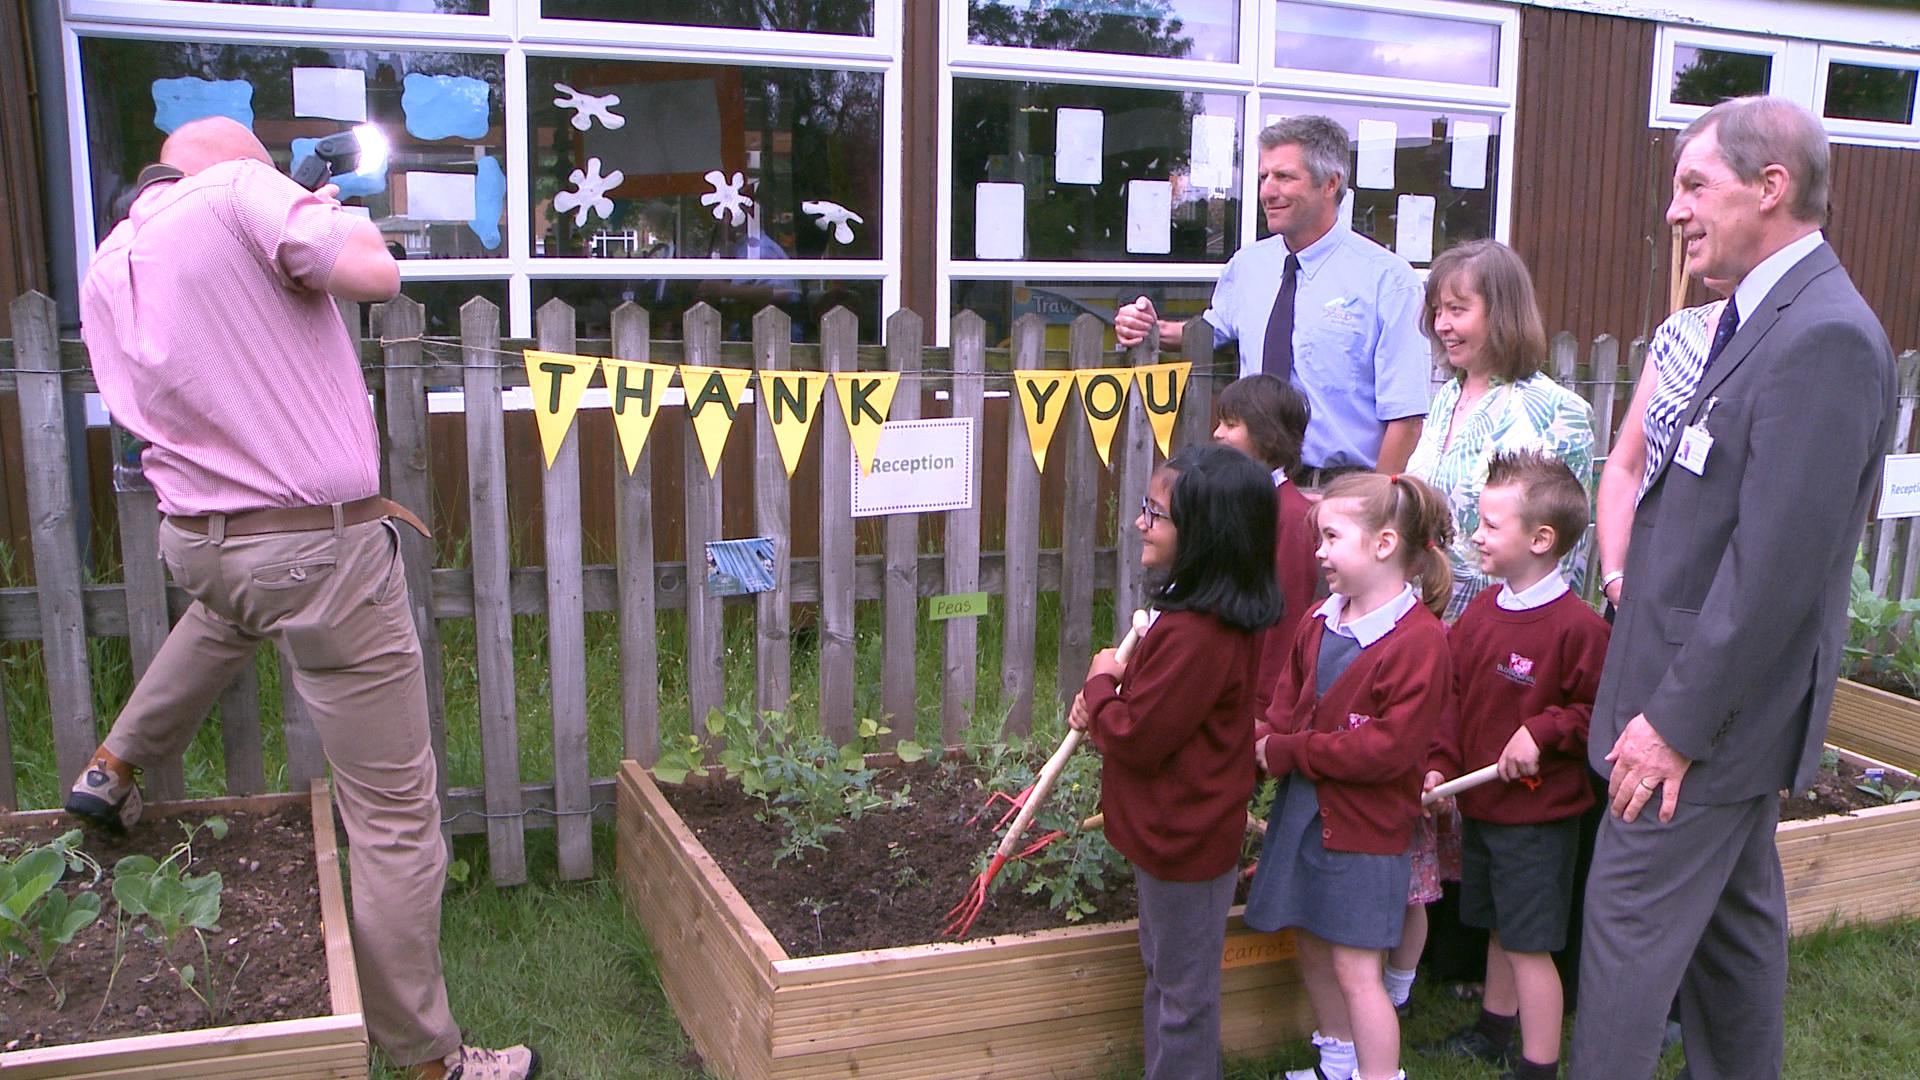 Blossomfield School